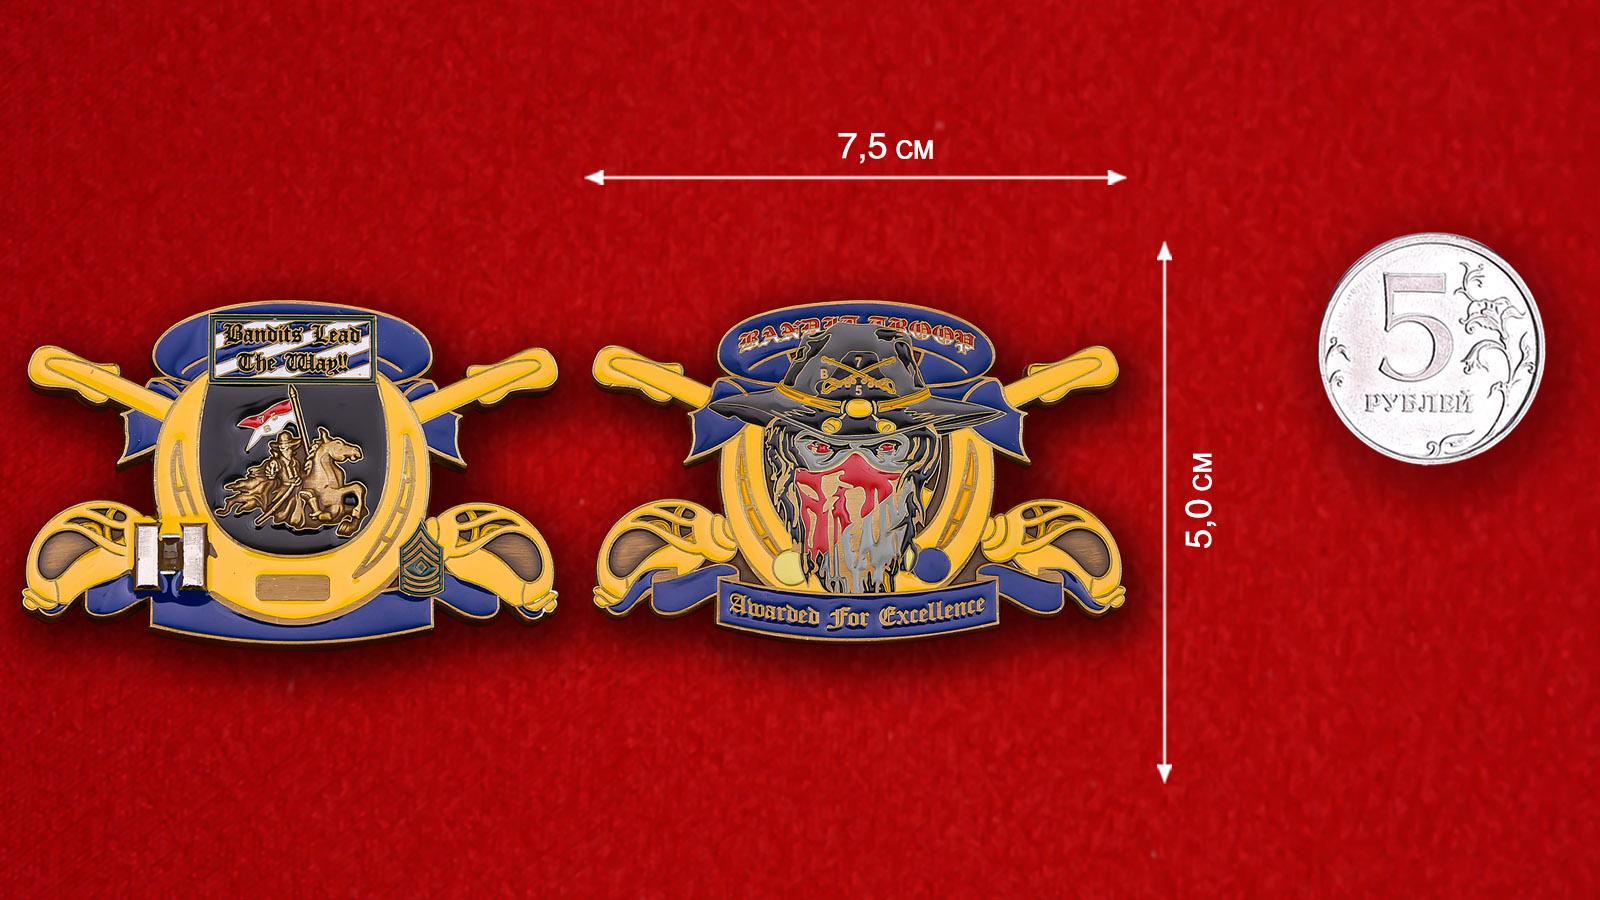 Челлендж коин 5-го эскадрона 7-го кавалерийского полка армии США